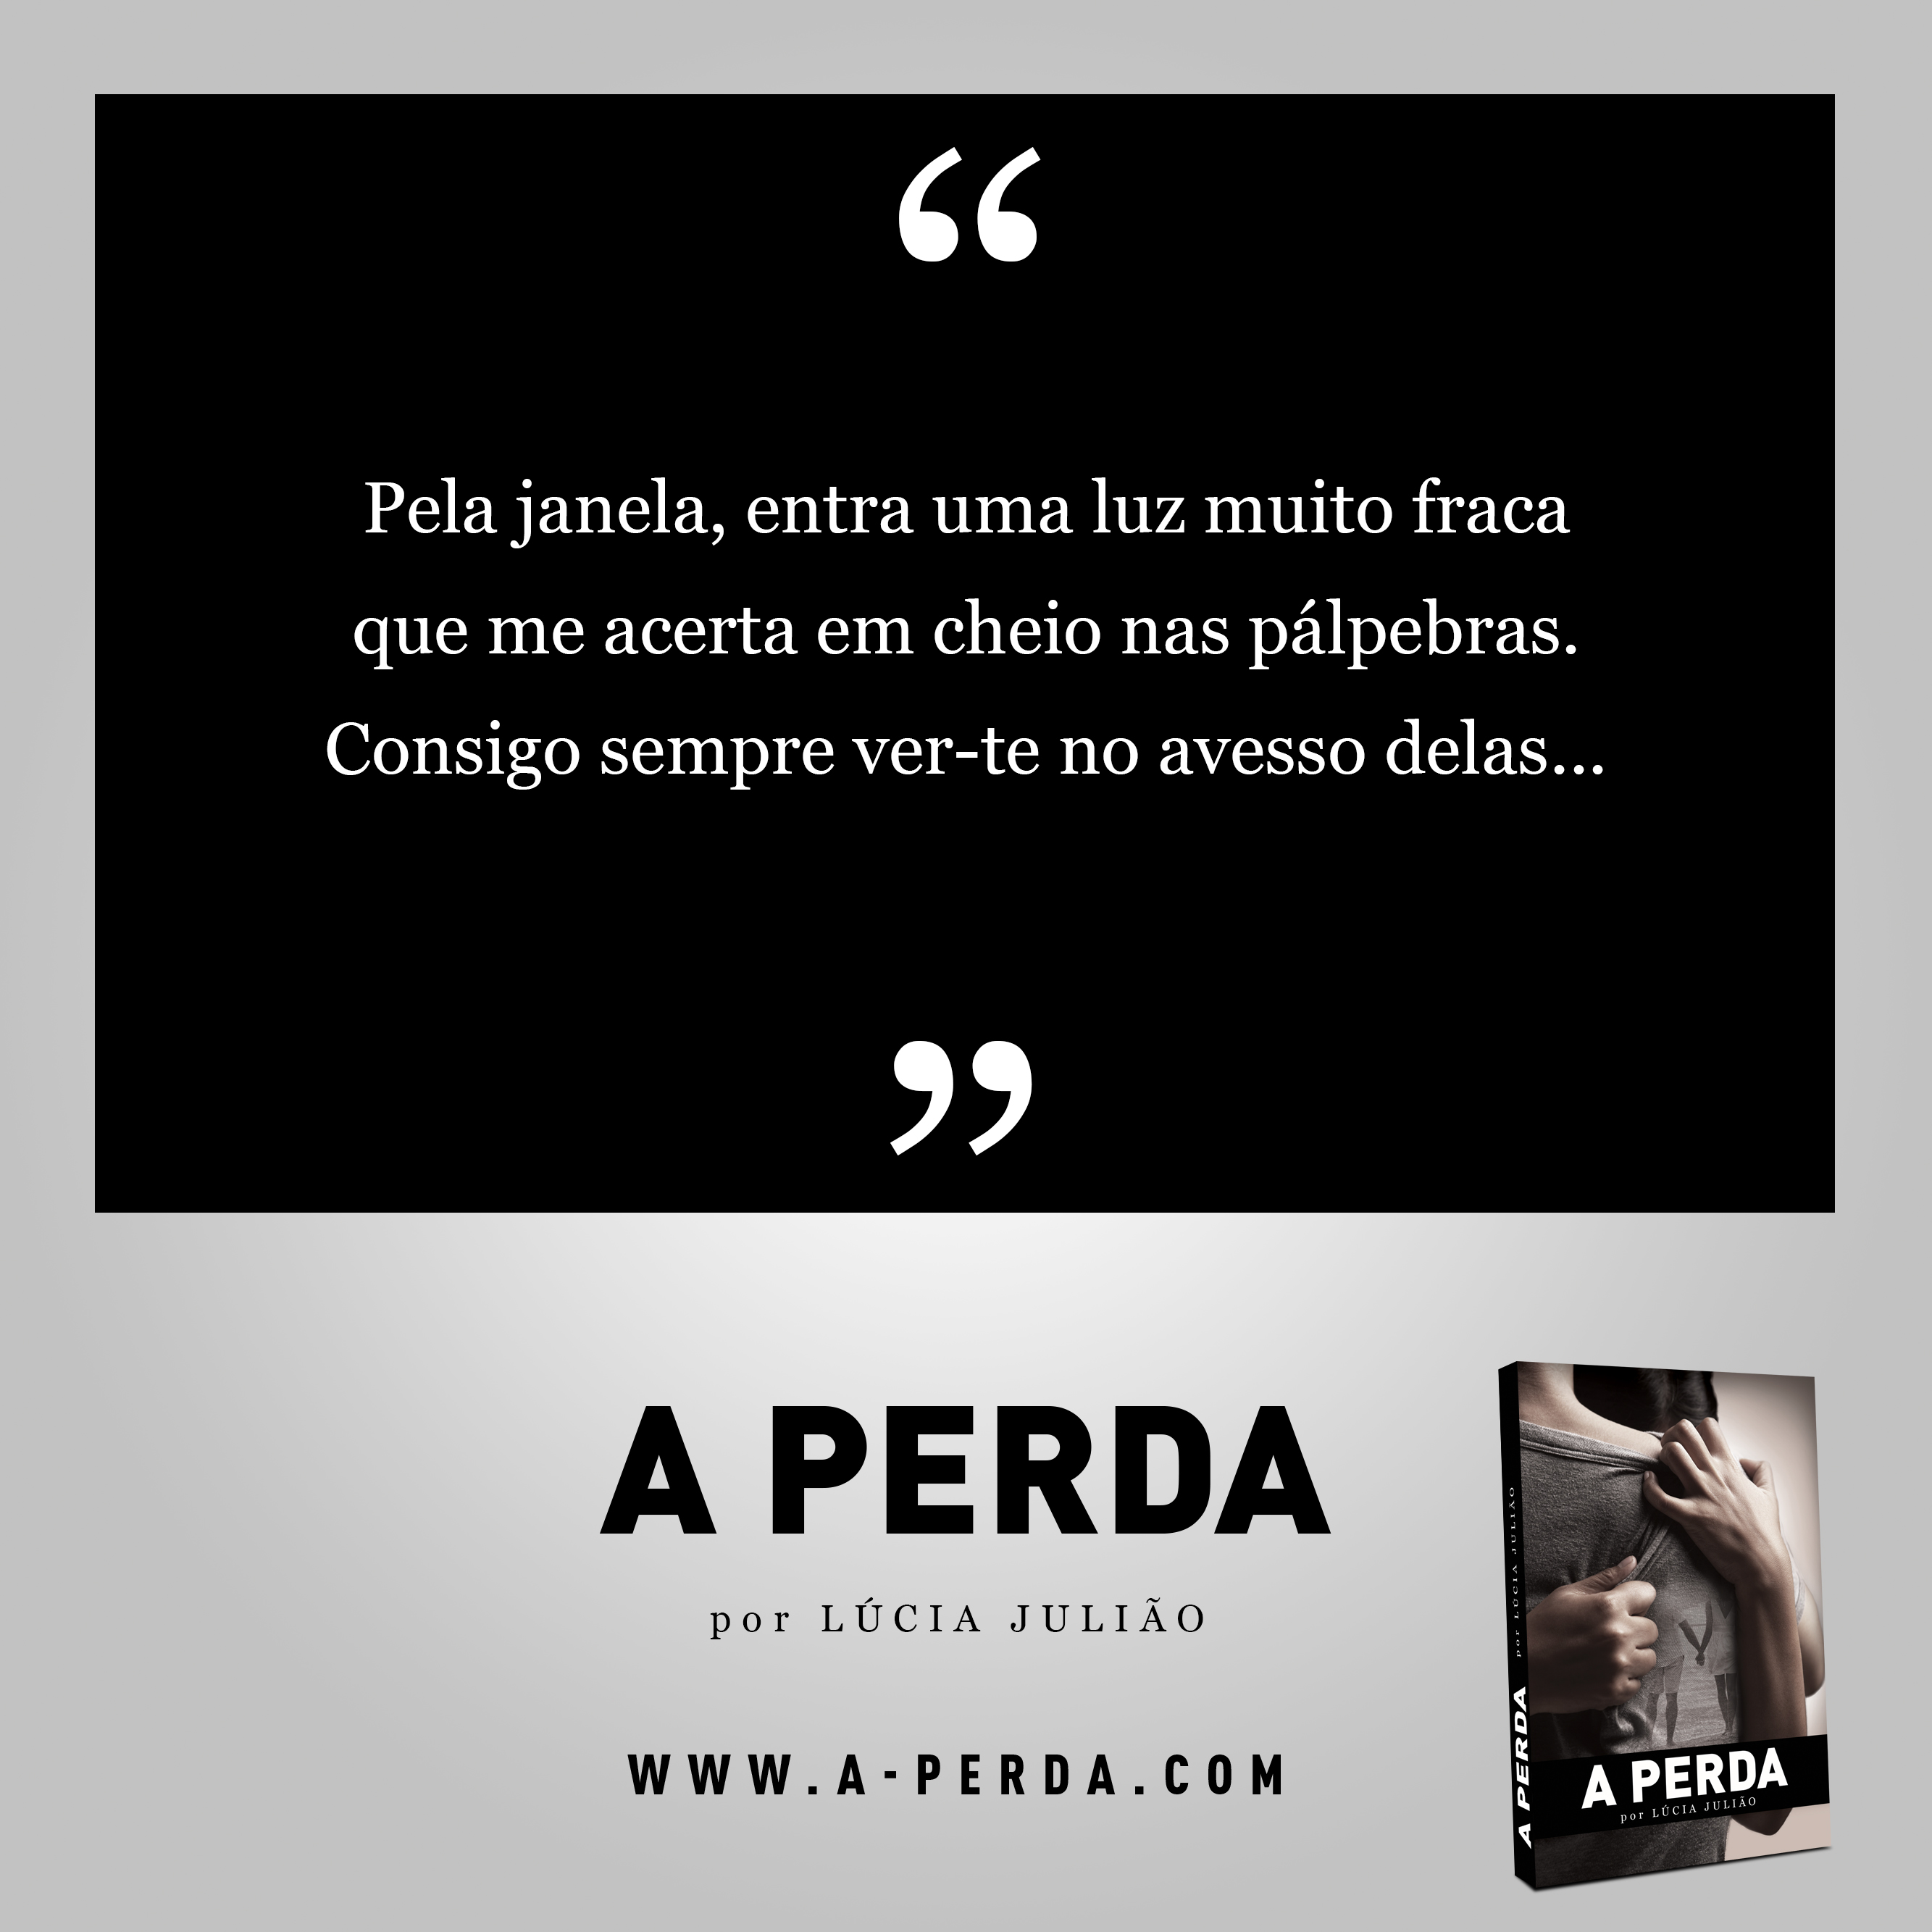 025-capitulo-20-livro-a-Perda-de-Lucia-Juliao-Instagram